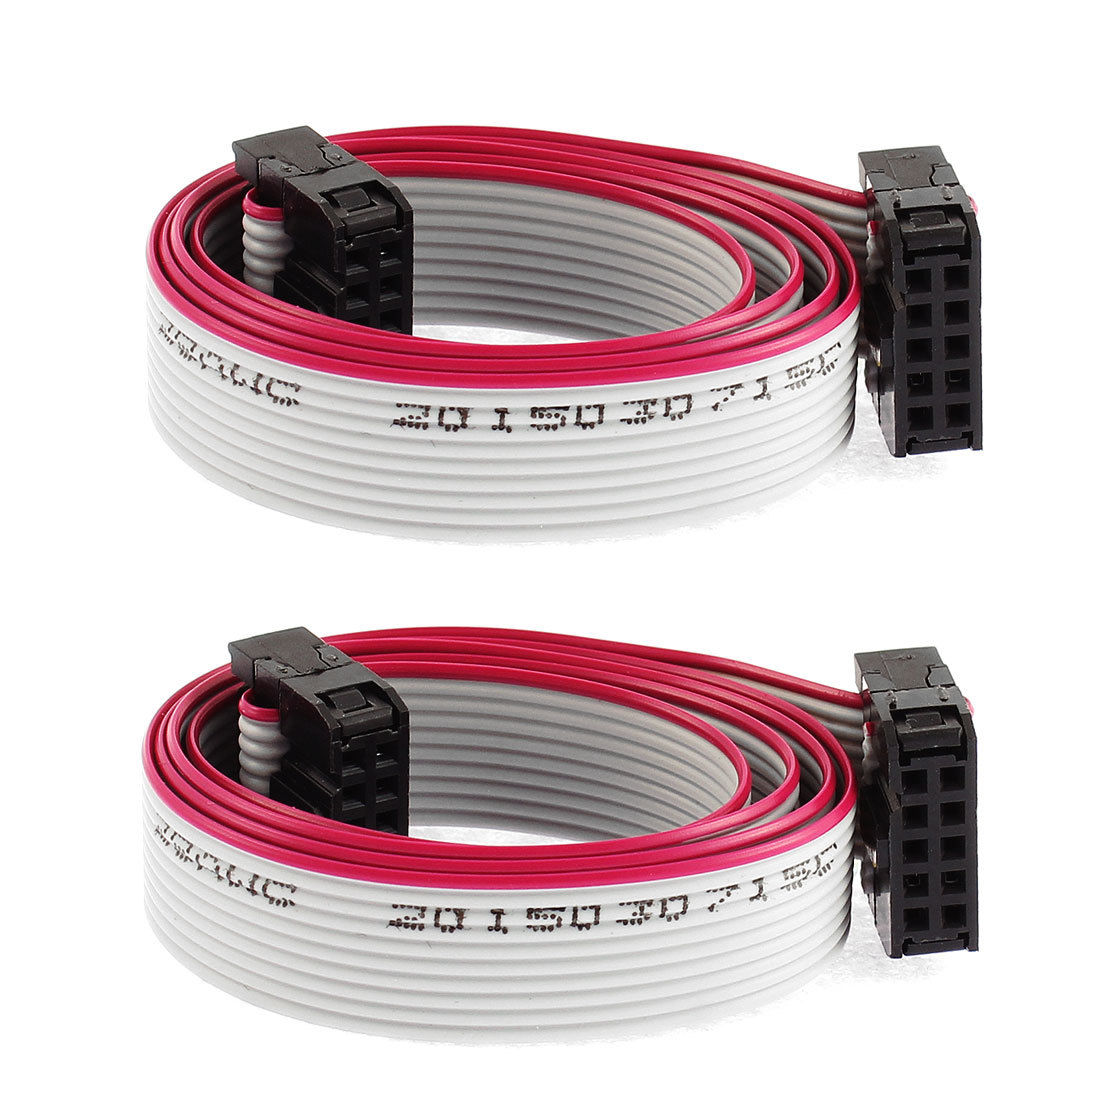 5 75 Aud 2 Pcs 10 Pin 10 Wire Idc Socket Flat Ribbon Cable 50cm Long Ebay Electronics Sockets Computer Accessories Ebay